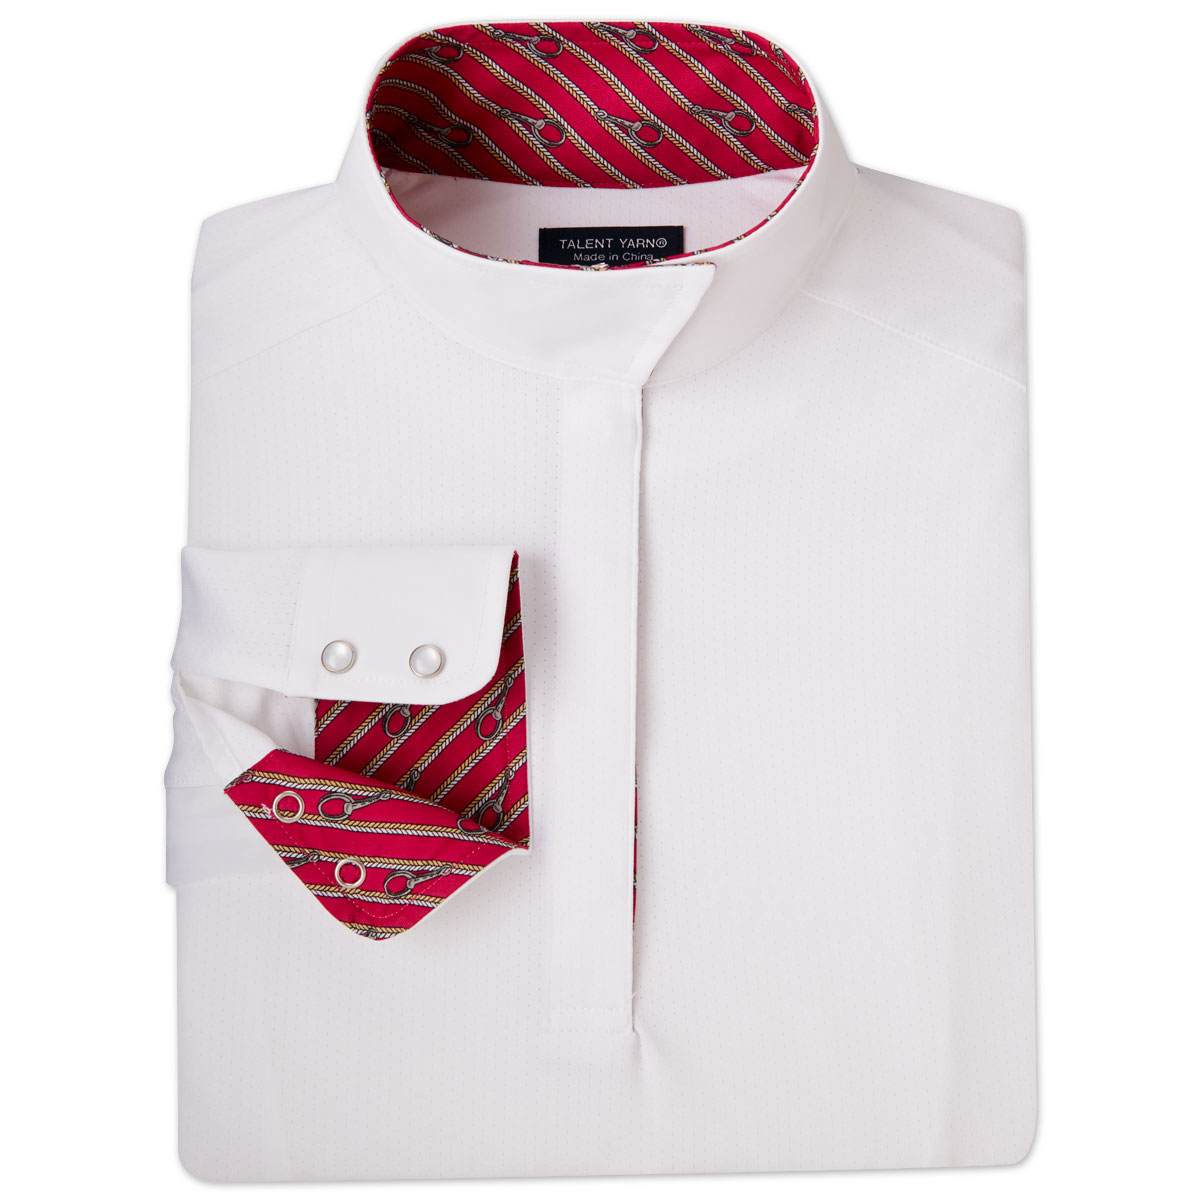 Essex Classics Talent Yarn Shirt - Longsleeve - Sale!